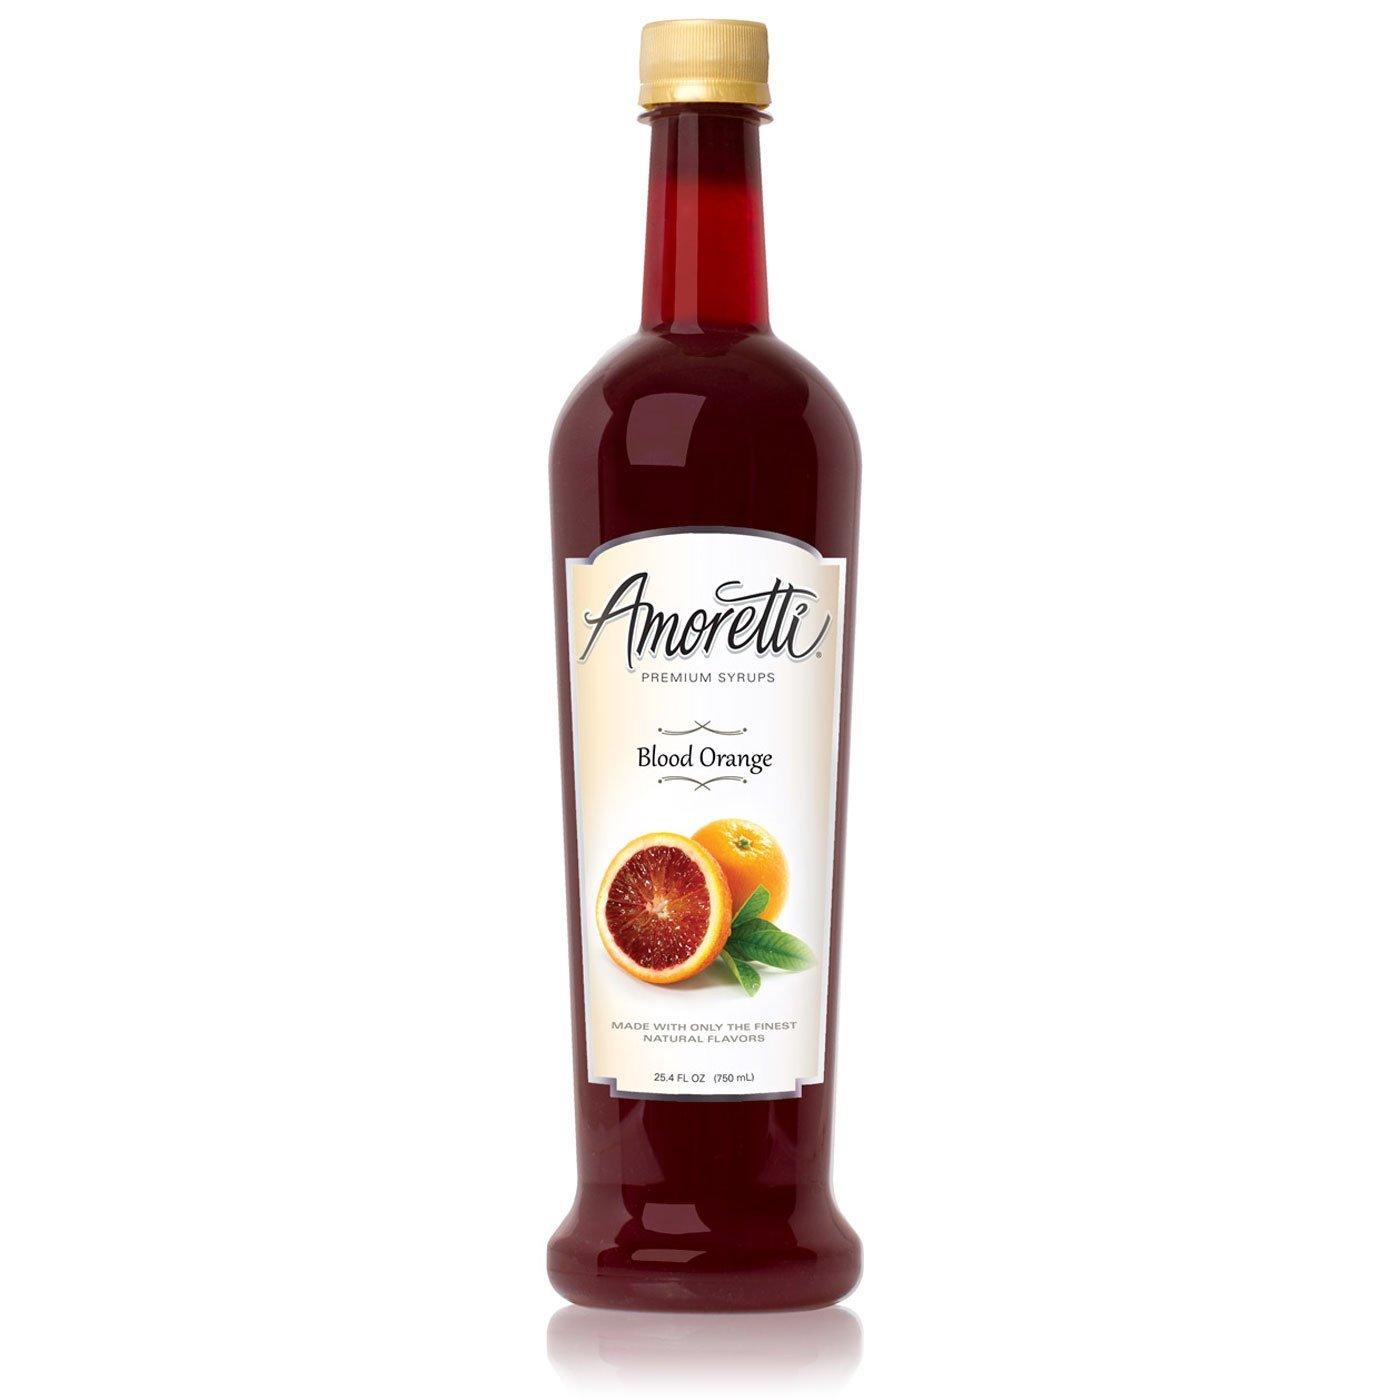 Amoretti Premium Syrup, Blood Orange, 25.4 Ounce